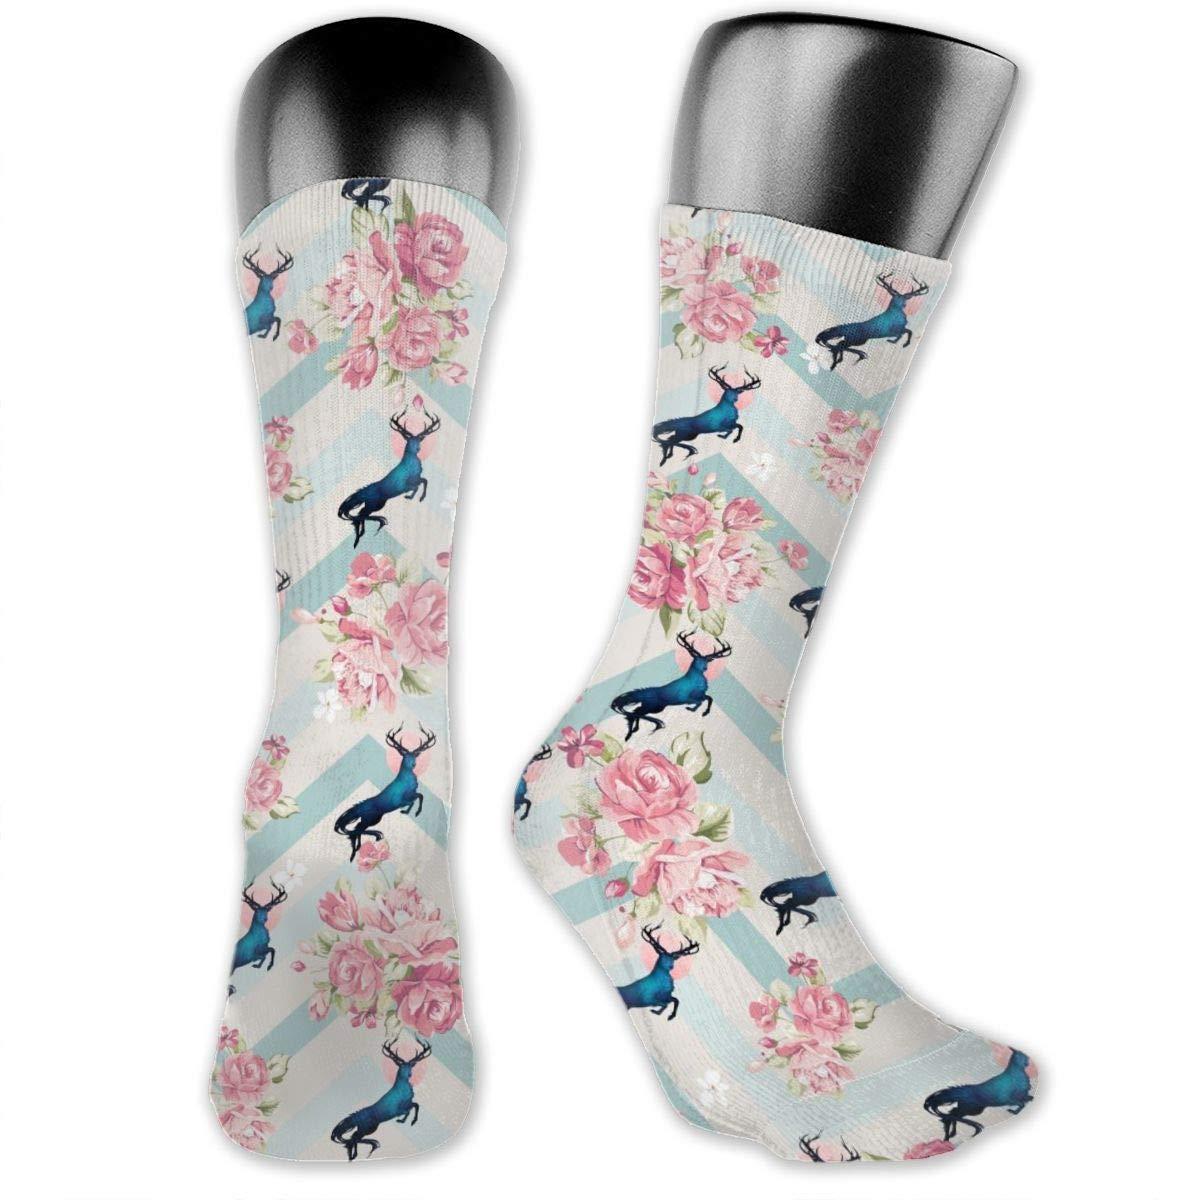 Personalized Stag Mythology Dress Socks For Women Men